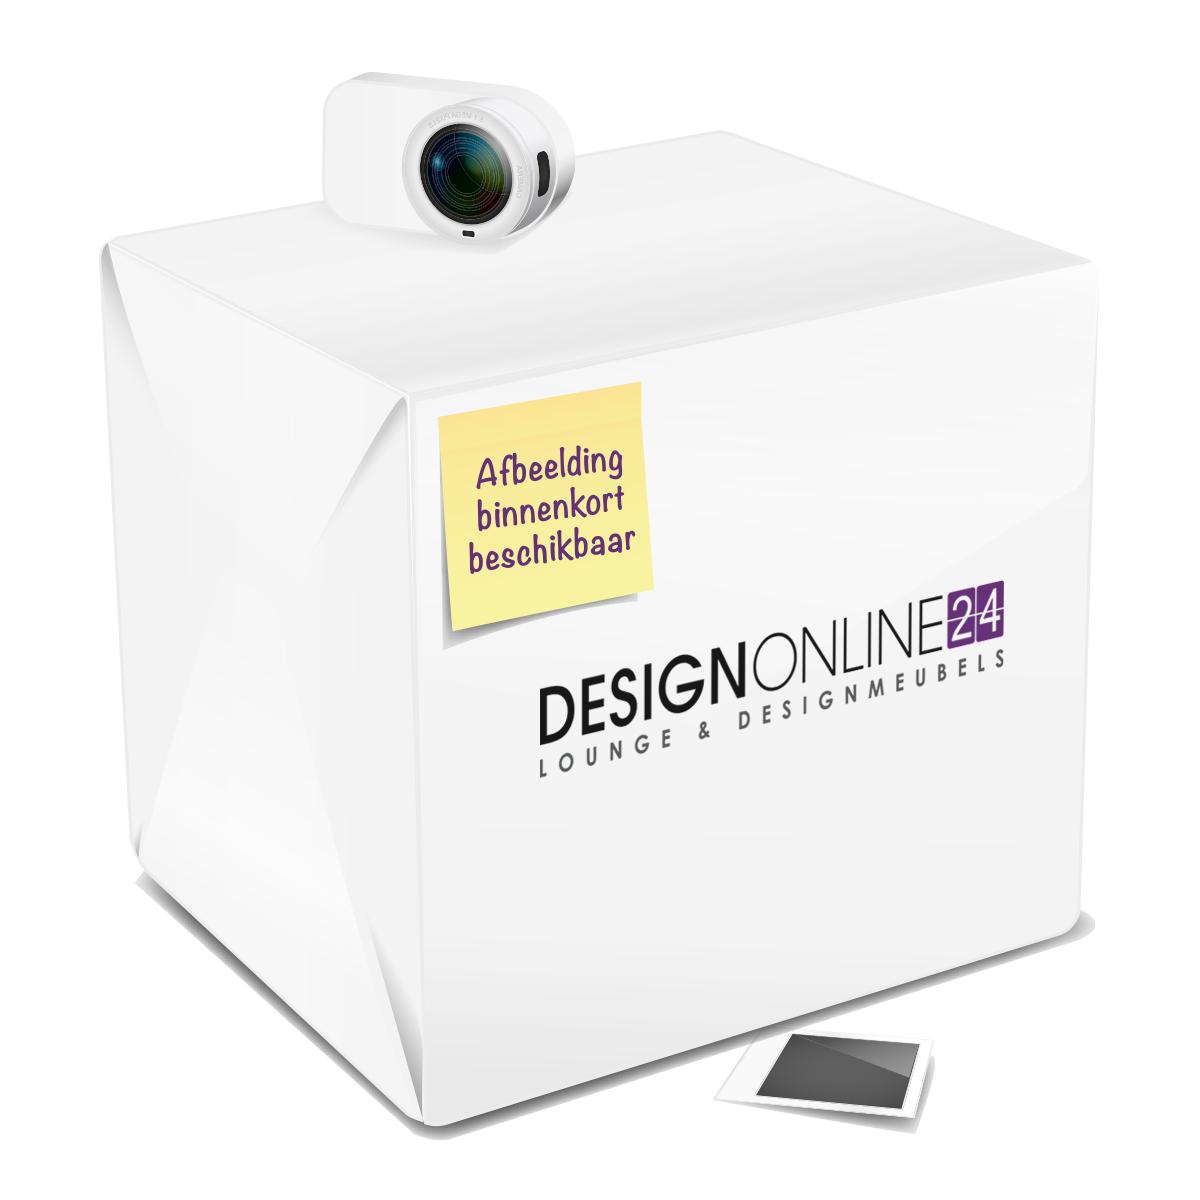 24Designs 24Designs Loungeset 6 Personen - Pomonte - Parelwit Polyrattan Wicker met Donkergrijze kussens